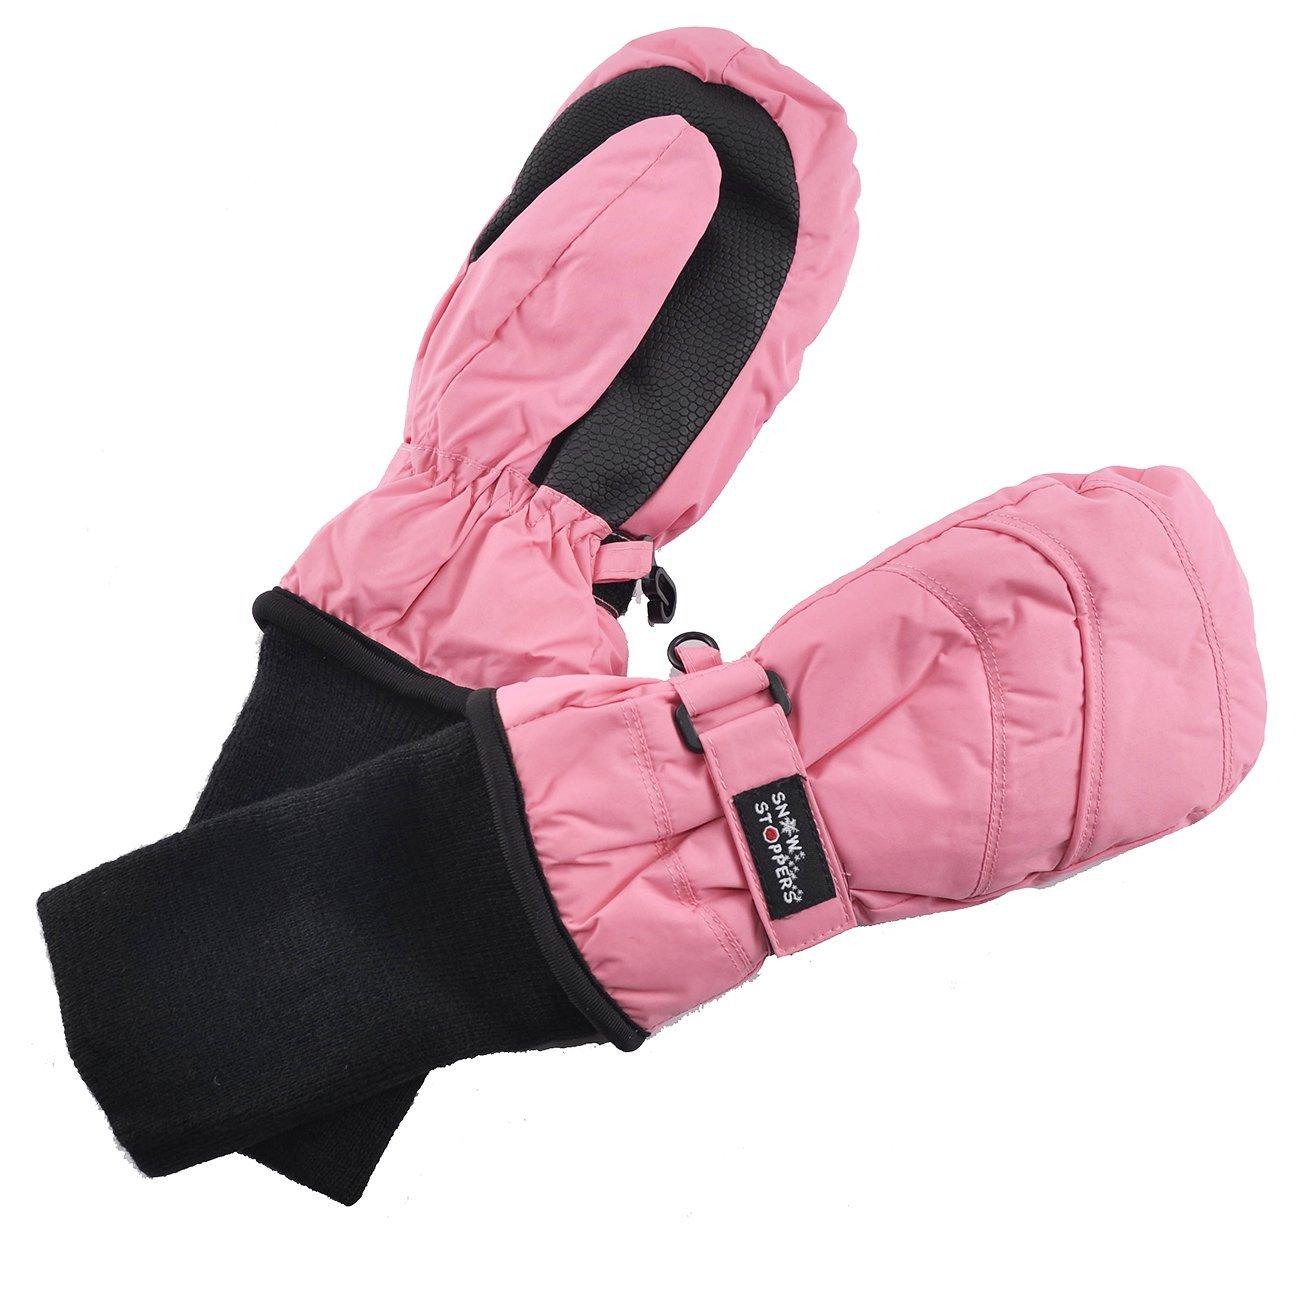 Kids Nylon Waterproof Mittens in Pink